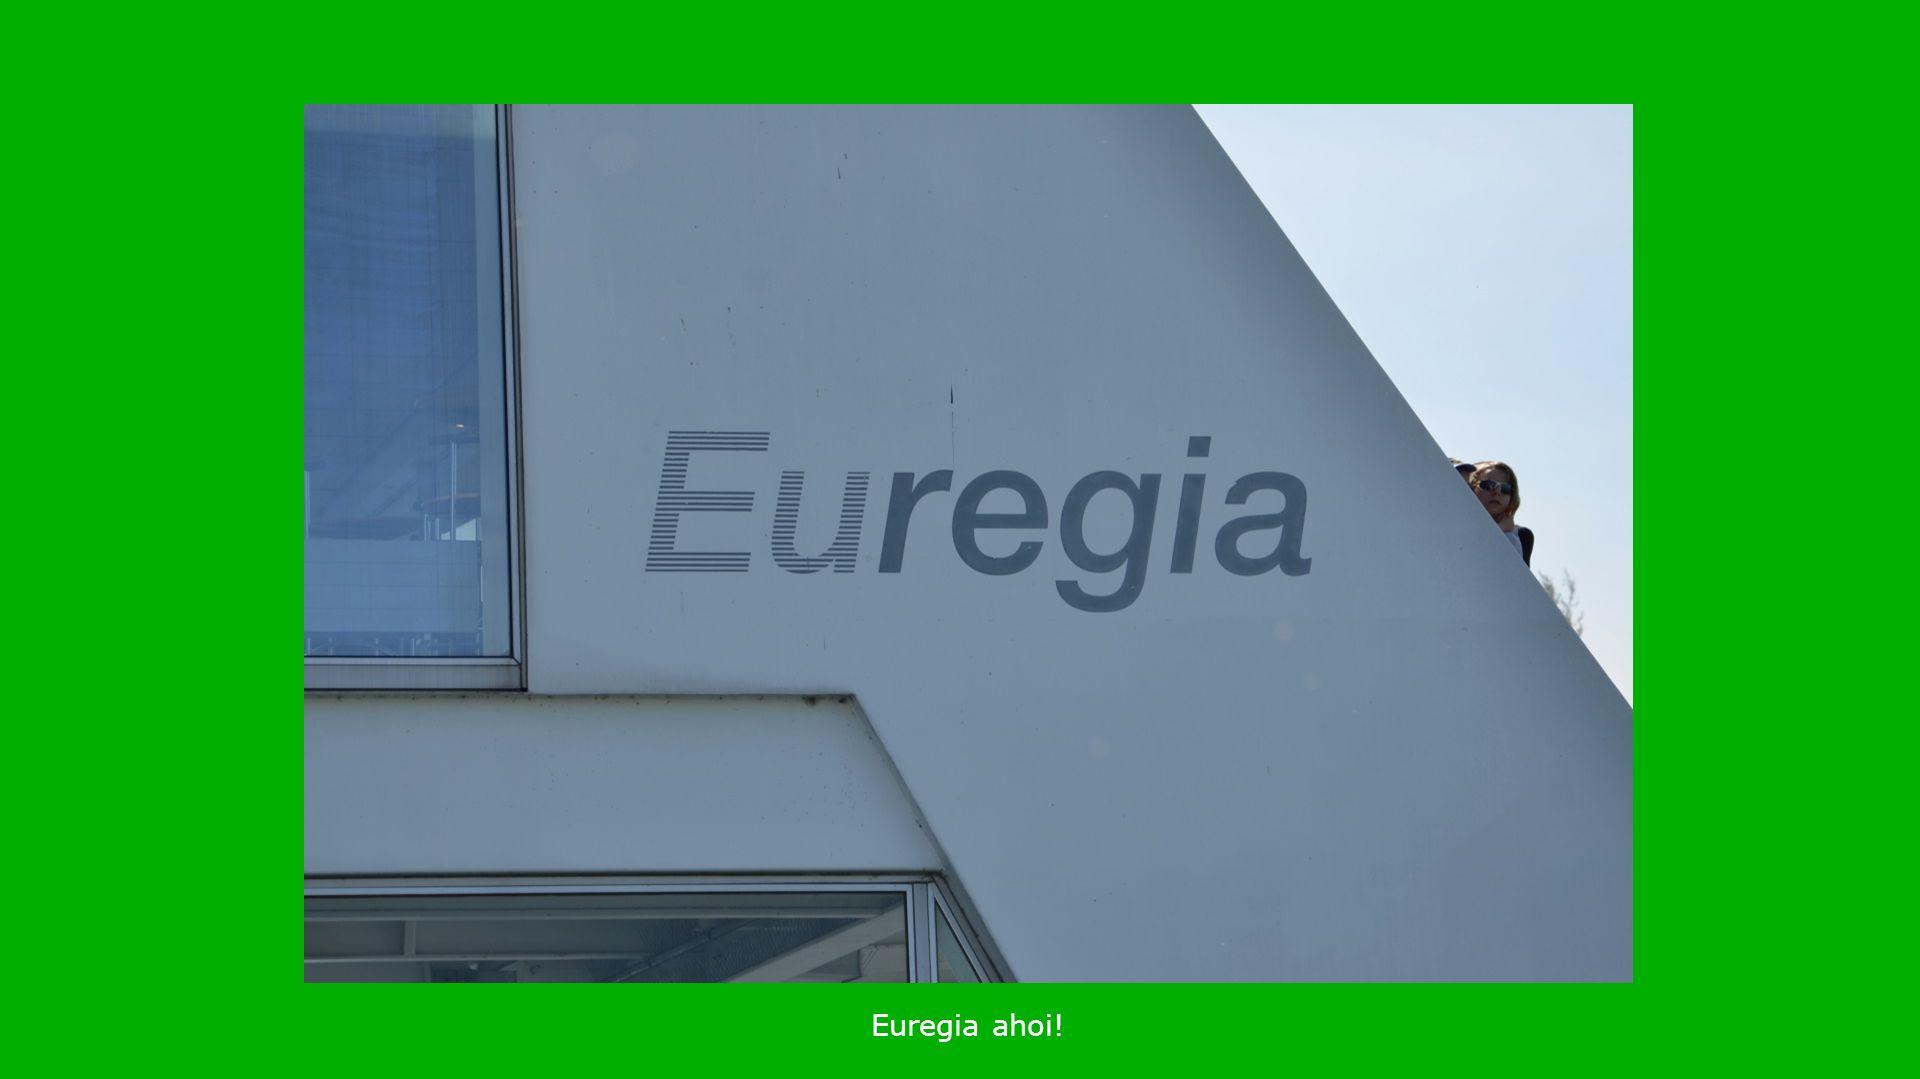 Euregia ahoi!